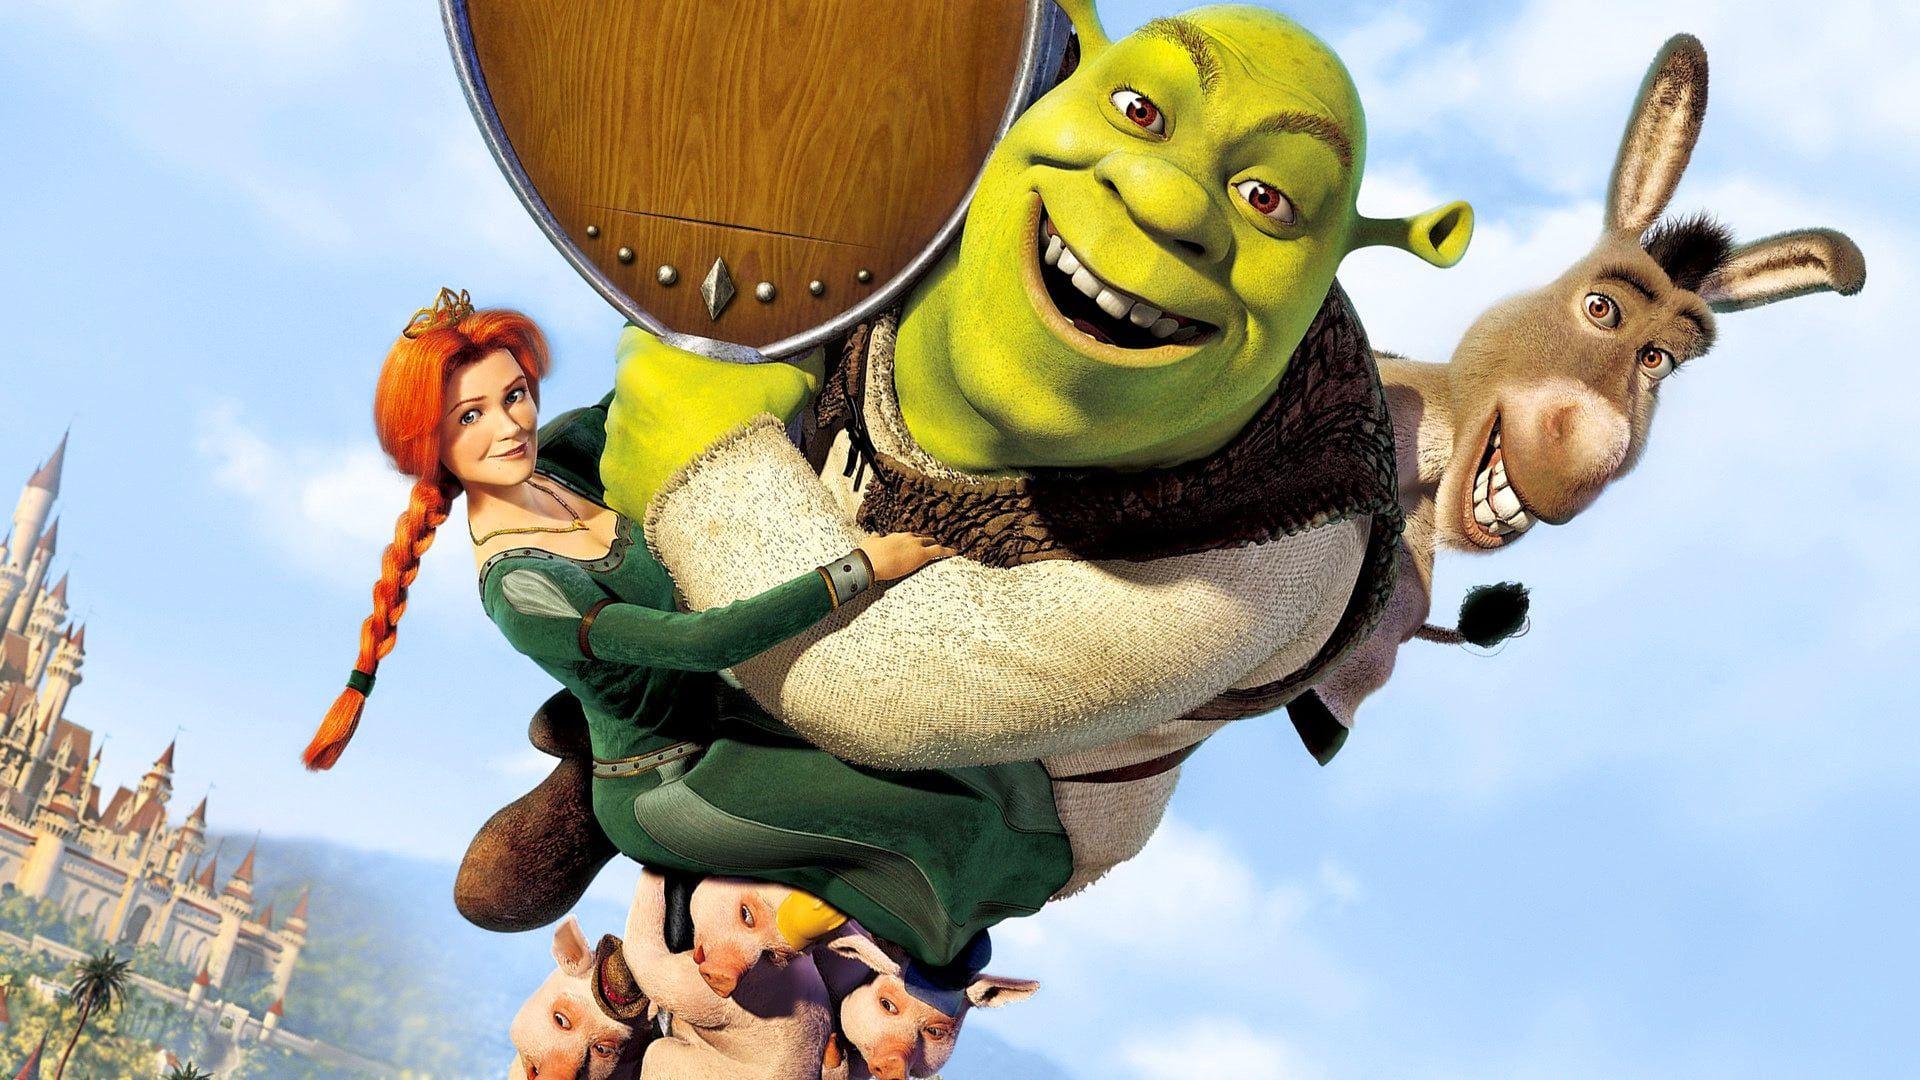 Altadefinizione Shrek 2 2004 Streaming Ita Cb01 Film Completo Cinema Guarda Shrek 2 Italiano 2004 Film Streaming Altad Shrek Fiona Y Shrek Princesa Fiona